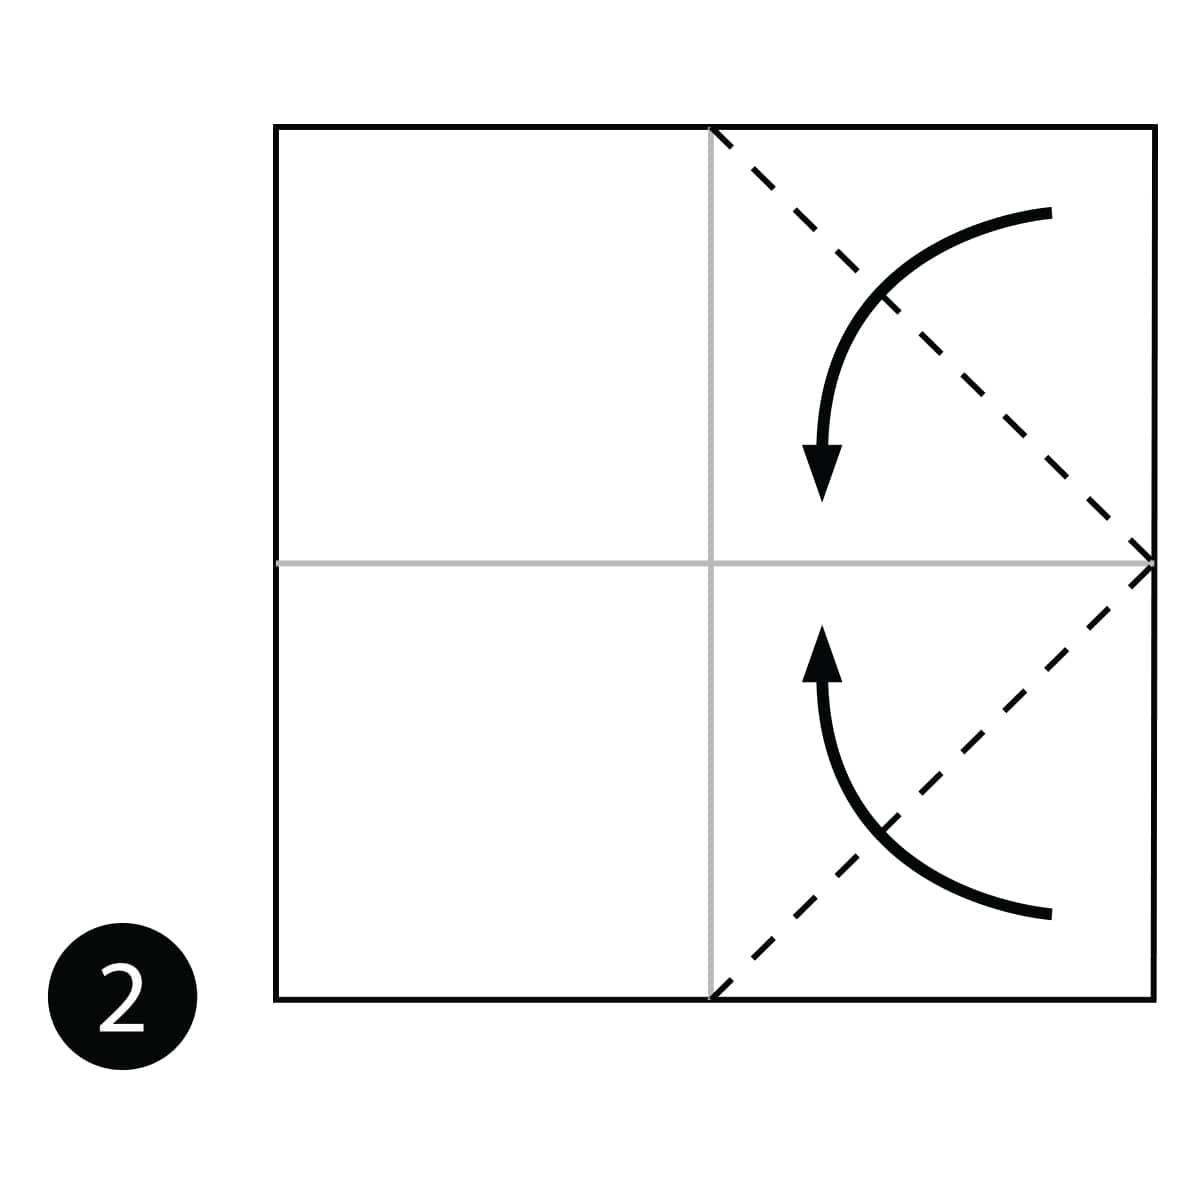 How to Make an Easy Origami Rhinoceros or Rhino